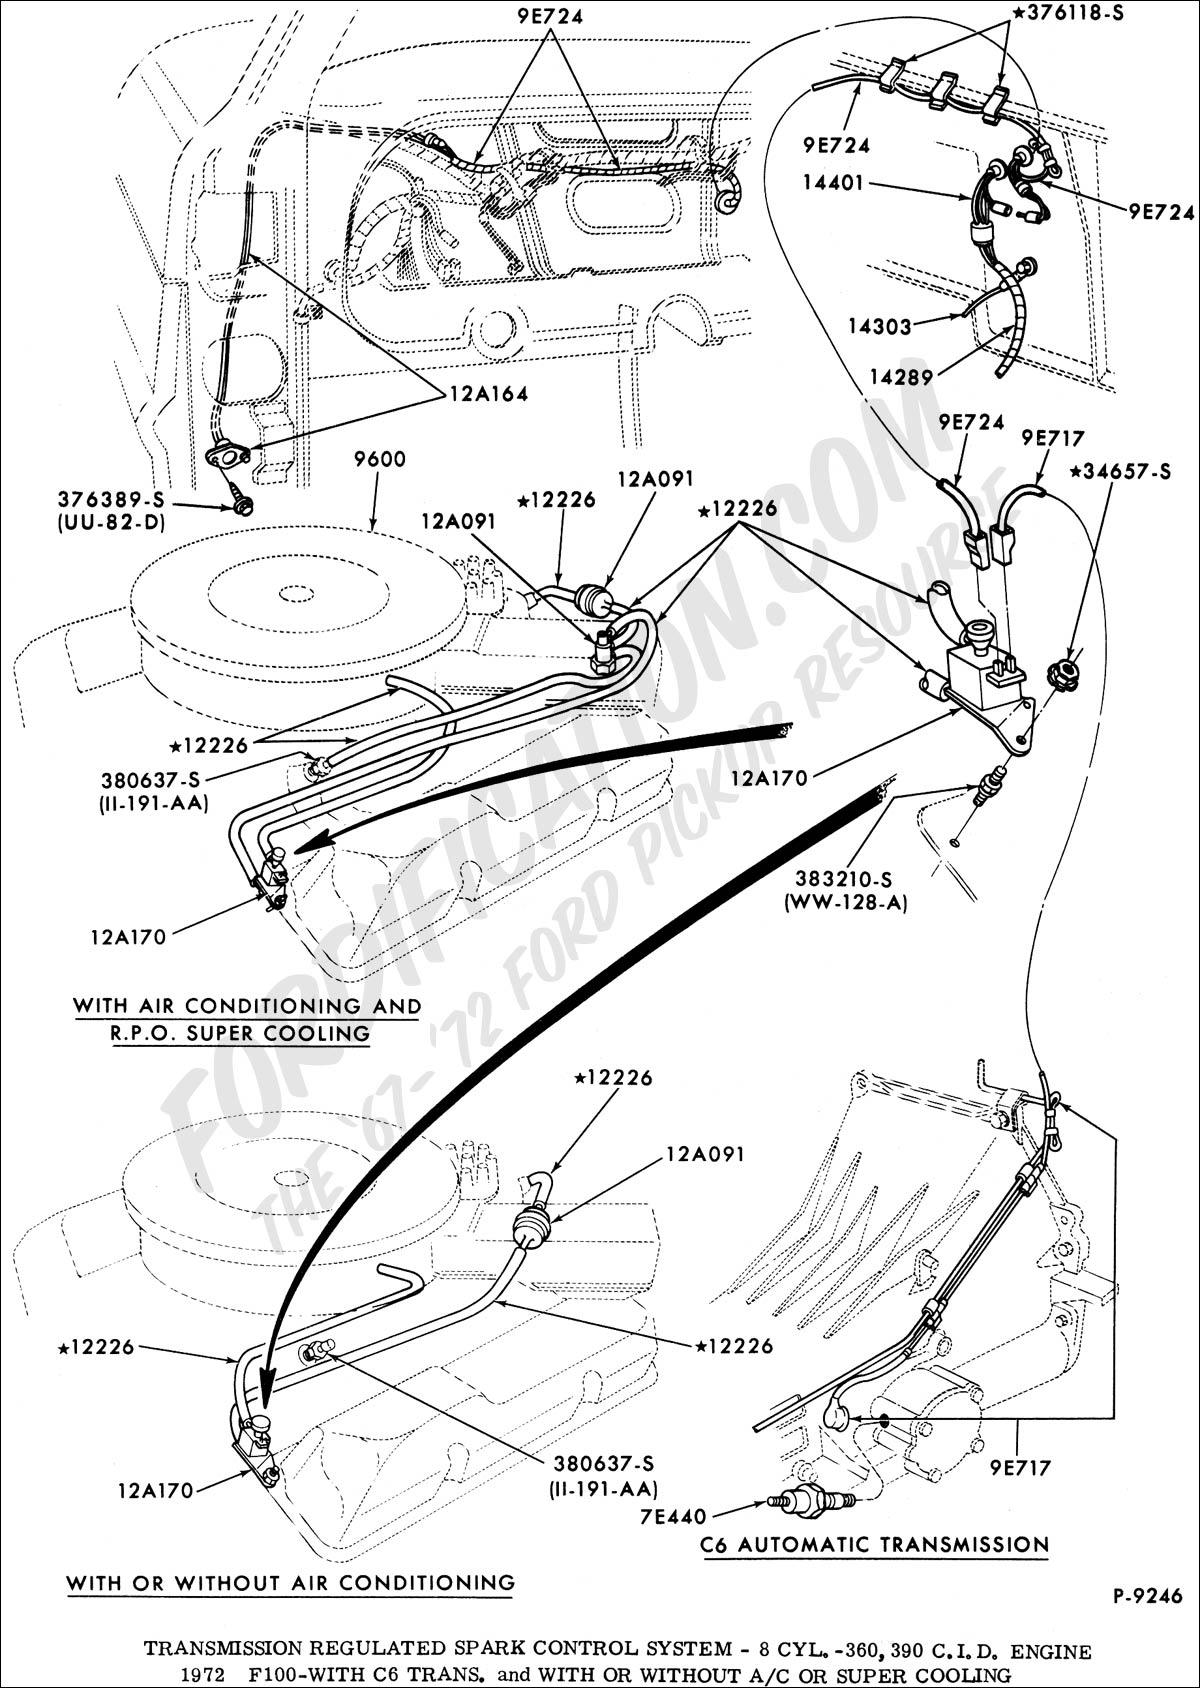 c6 engine harness diagram